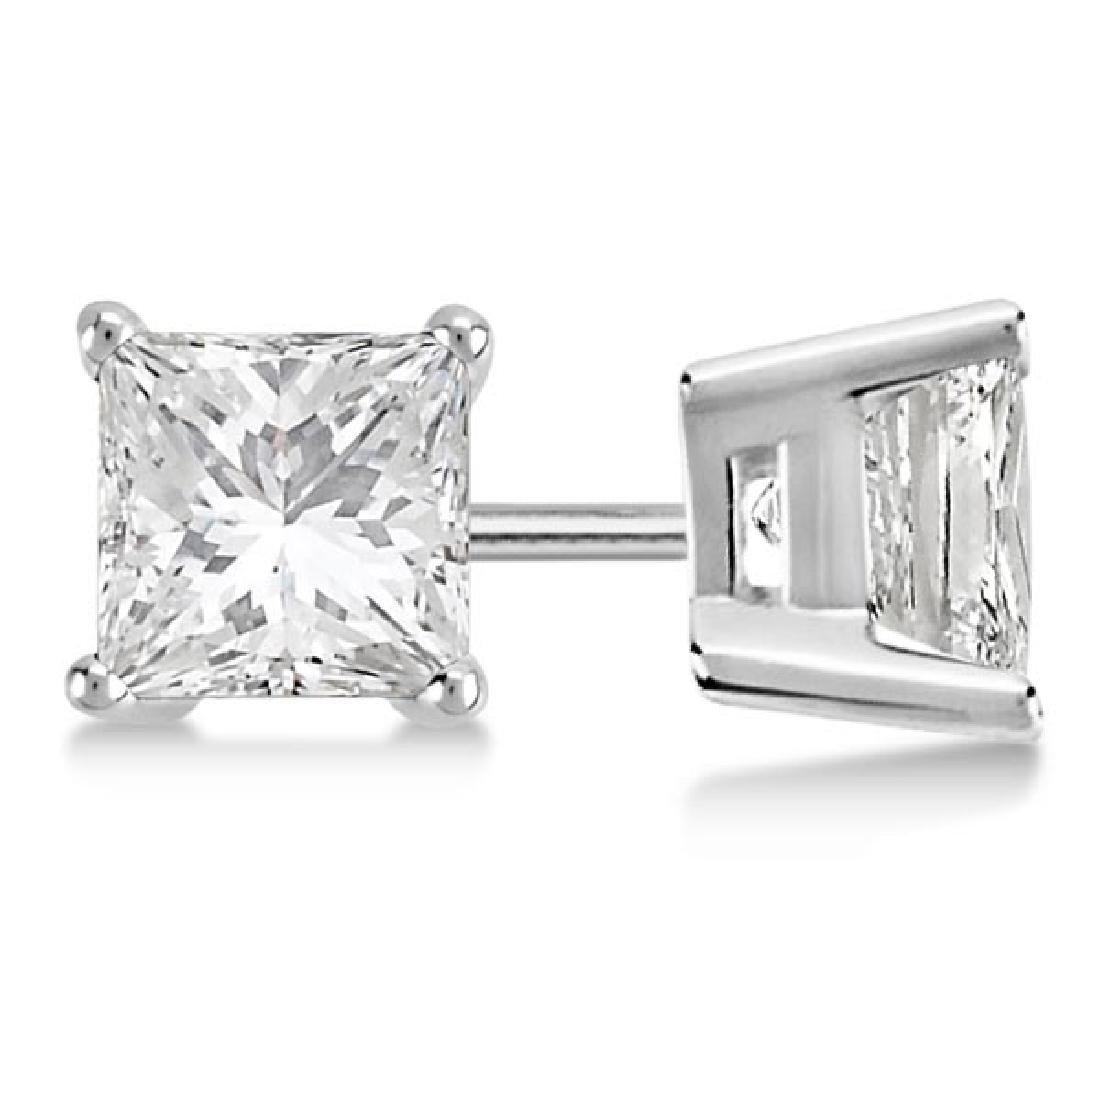 Certified 1.02 CTW Princess Diamond Stud Earrings I/SI2